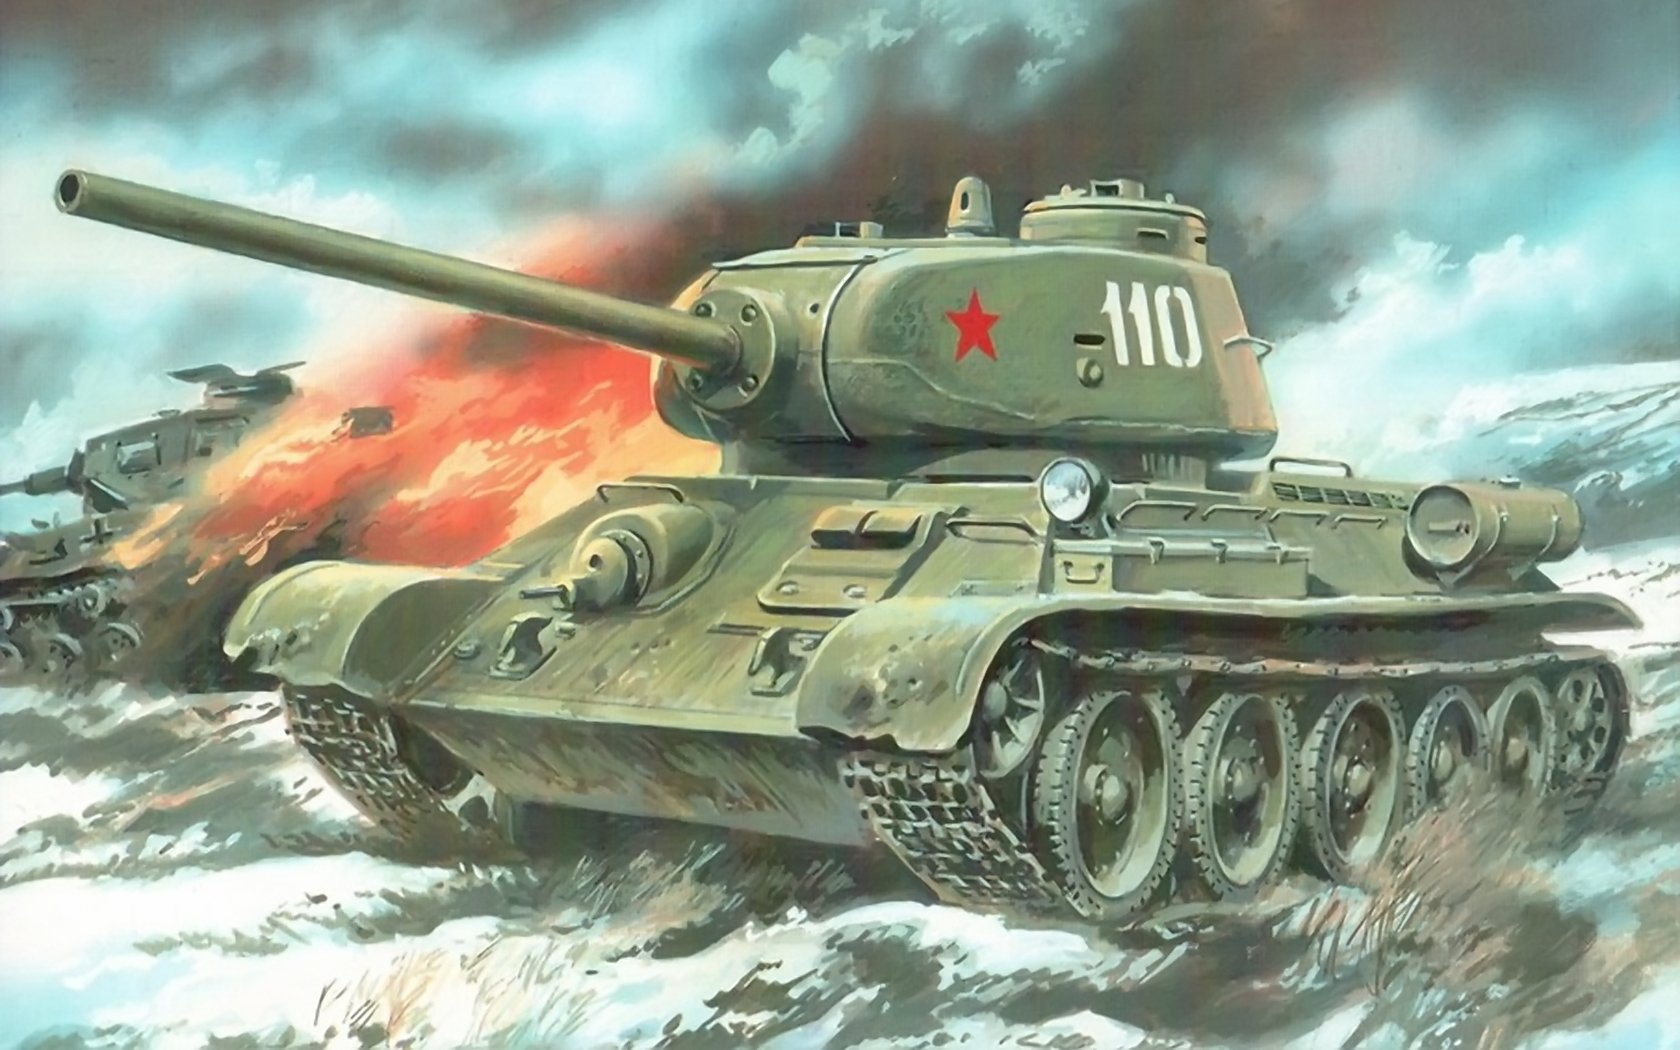 Custom Silk Photo Wallpaper Hd Military Tank Wall: T-34 Wallpaper And Background Image